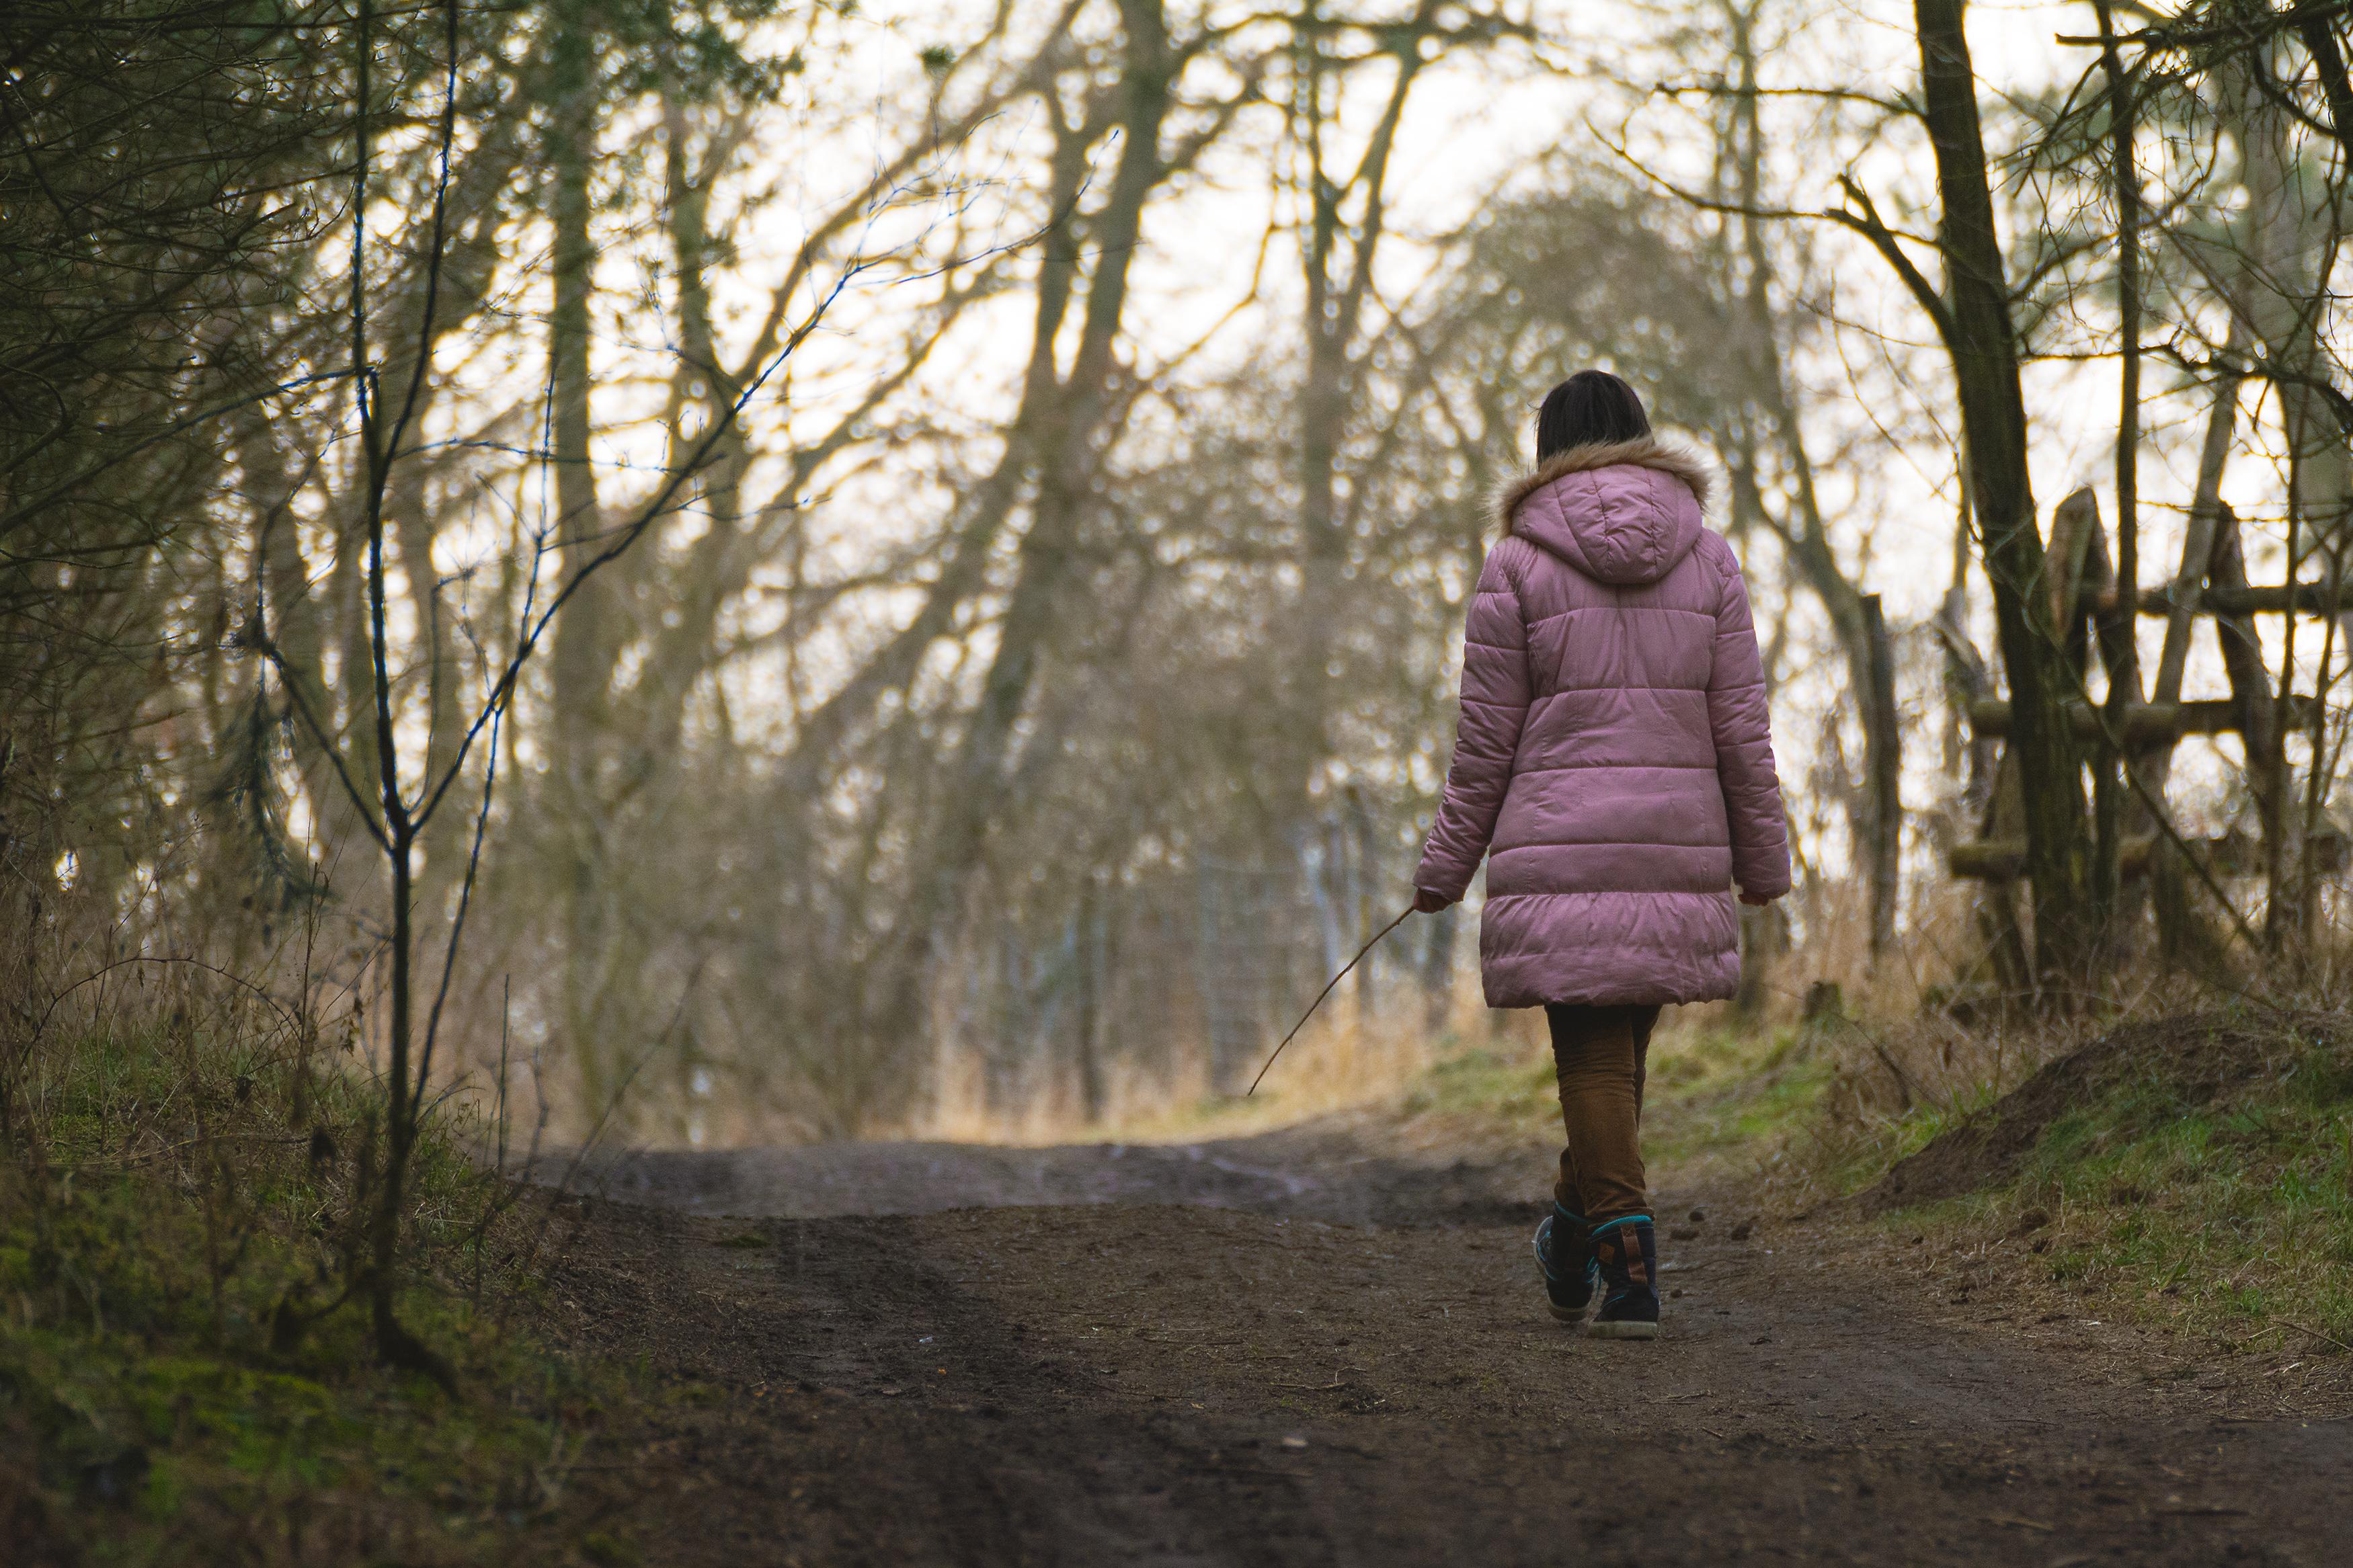 Lonely Woman Walking | Free Stock Photo | LibreShot